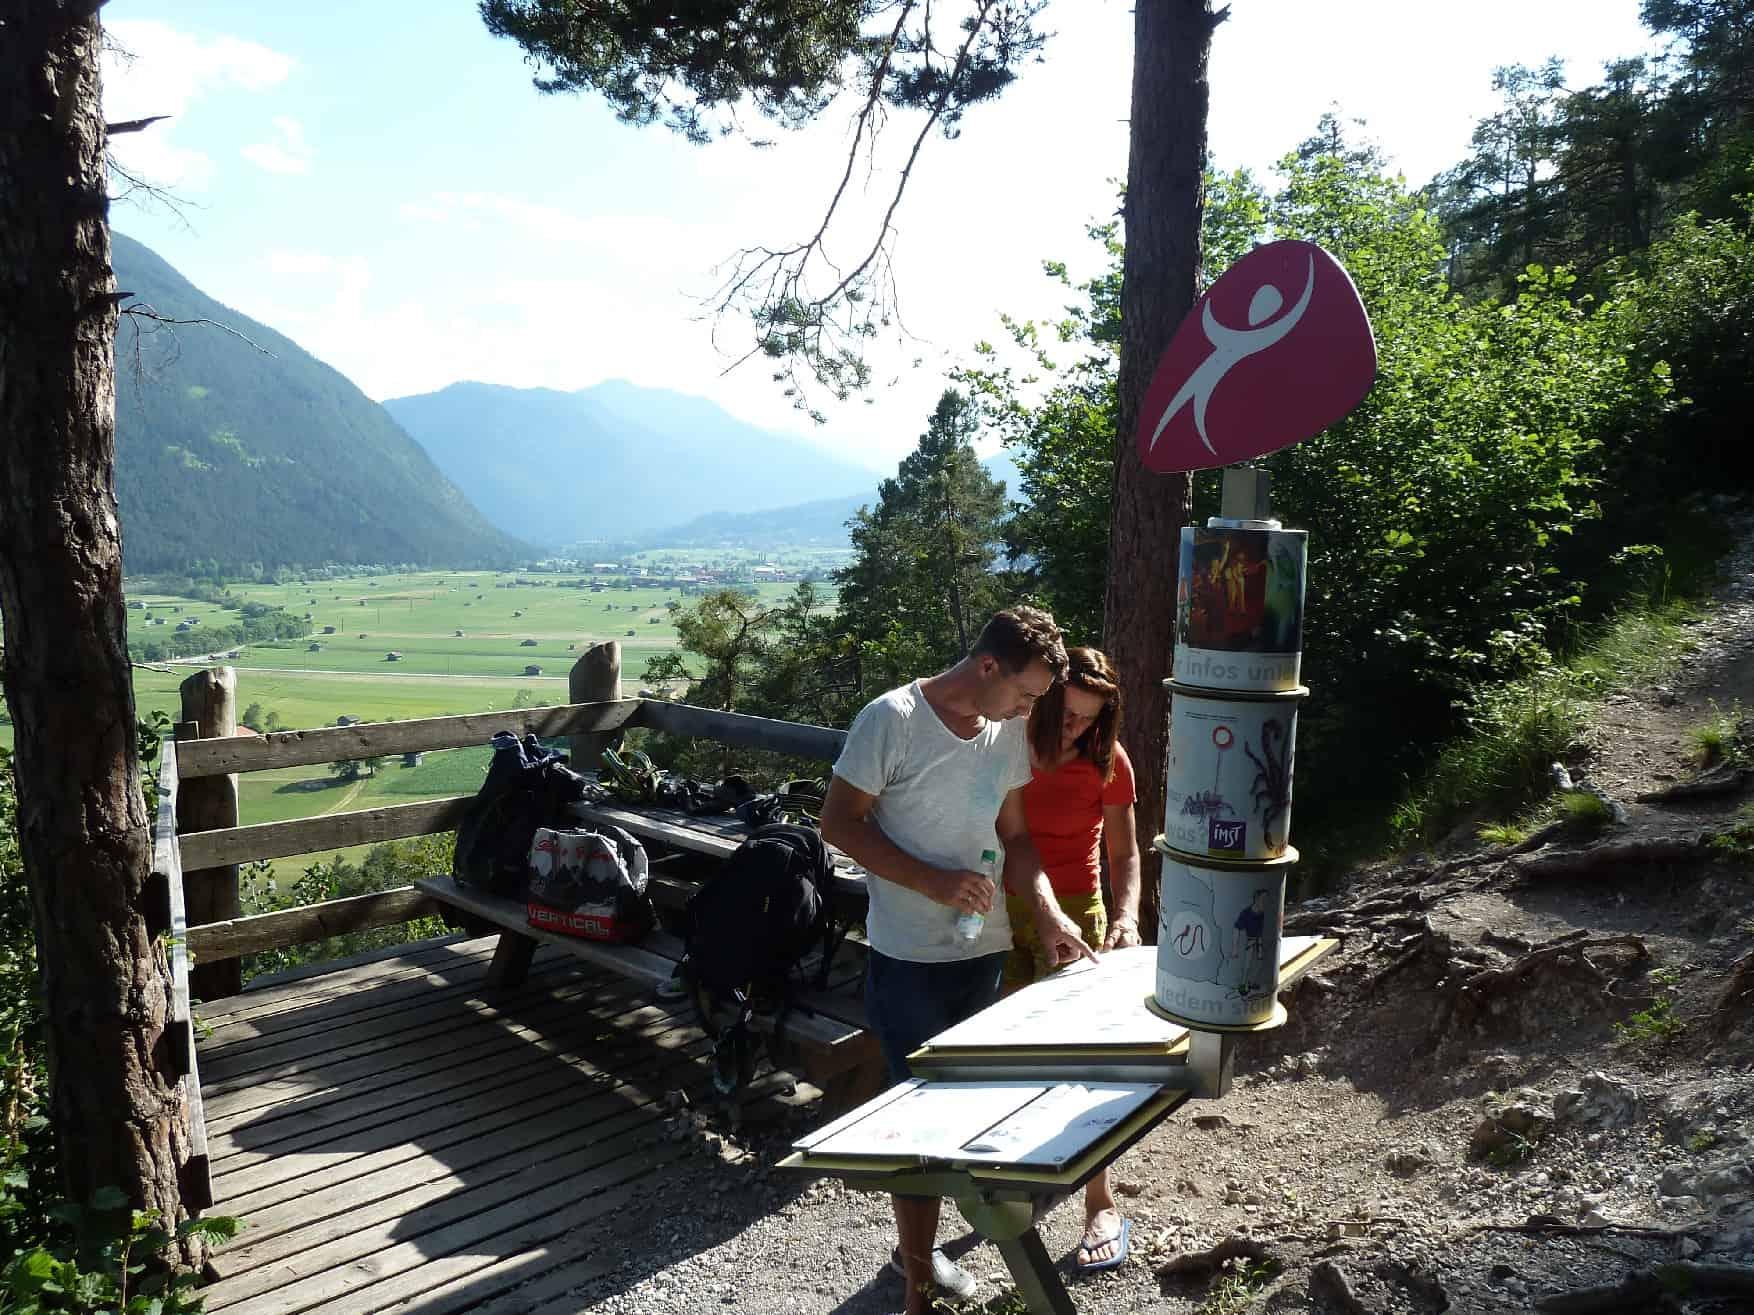 Klettern bei Walchenbach